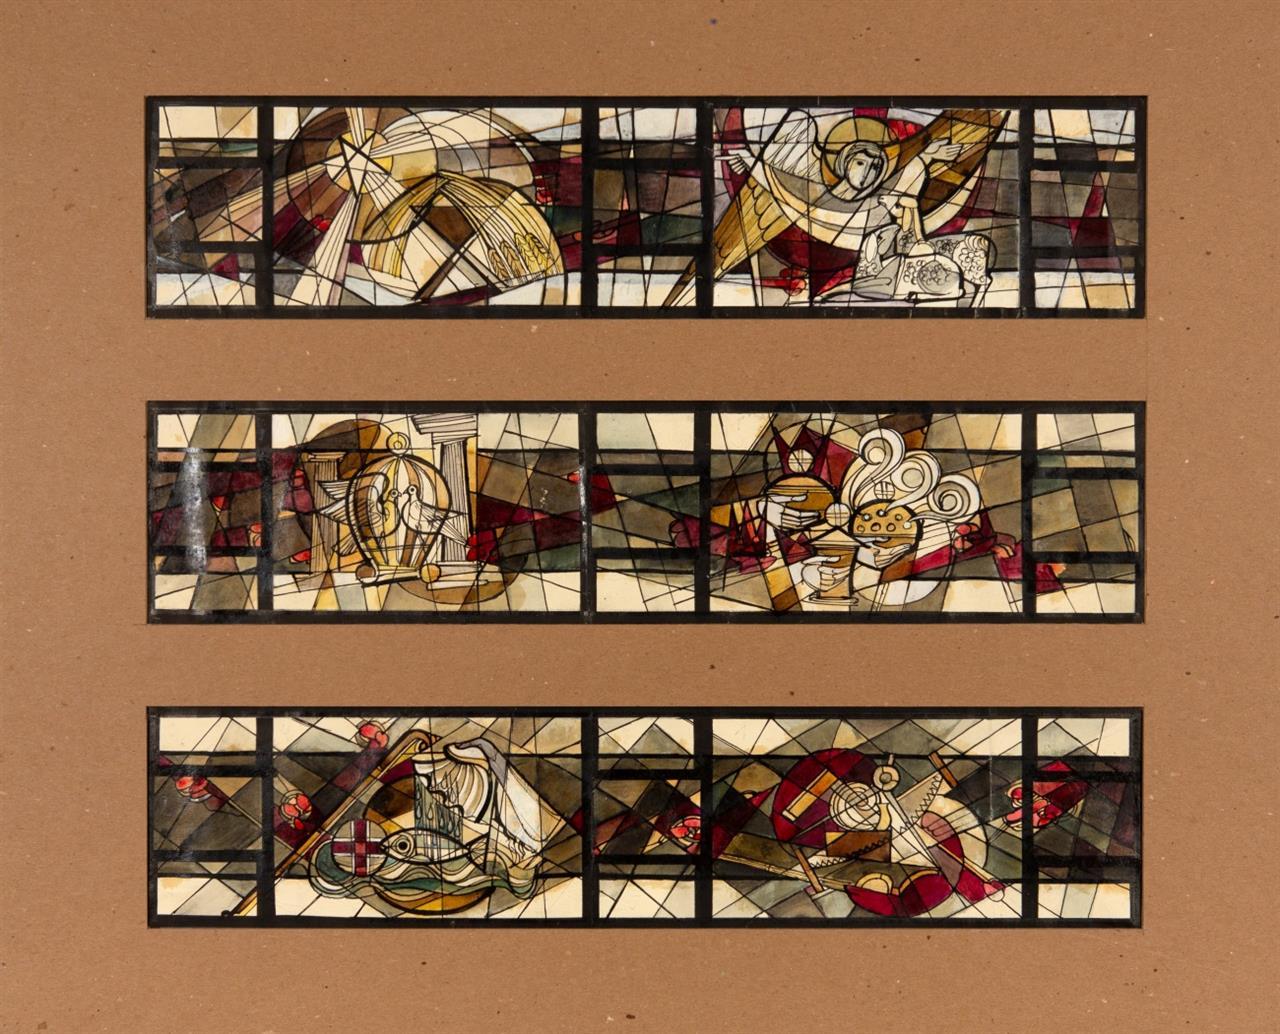 Victor Bonato. Clerestory Windows - Immanuel Luth. Church, Madison, Wisc. North Side / South Side. 2 Blatt Tusche, Bleistift und Aquarell.